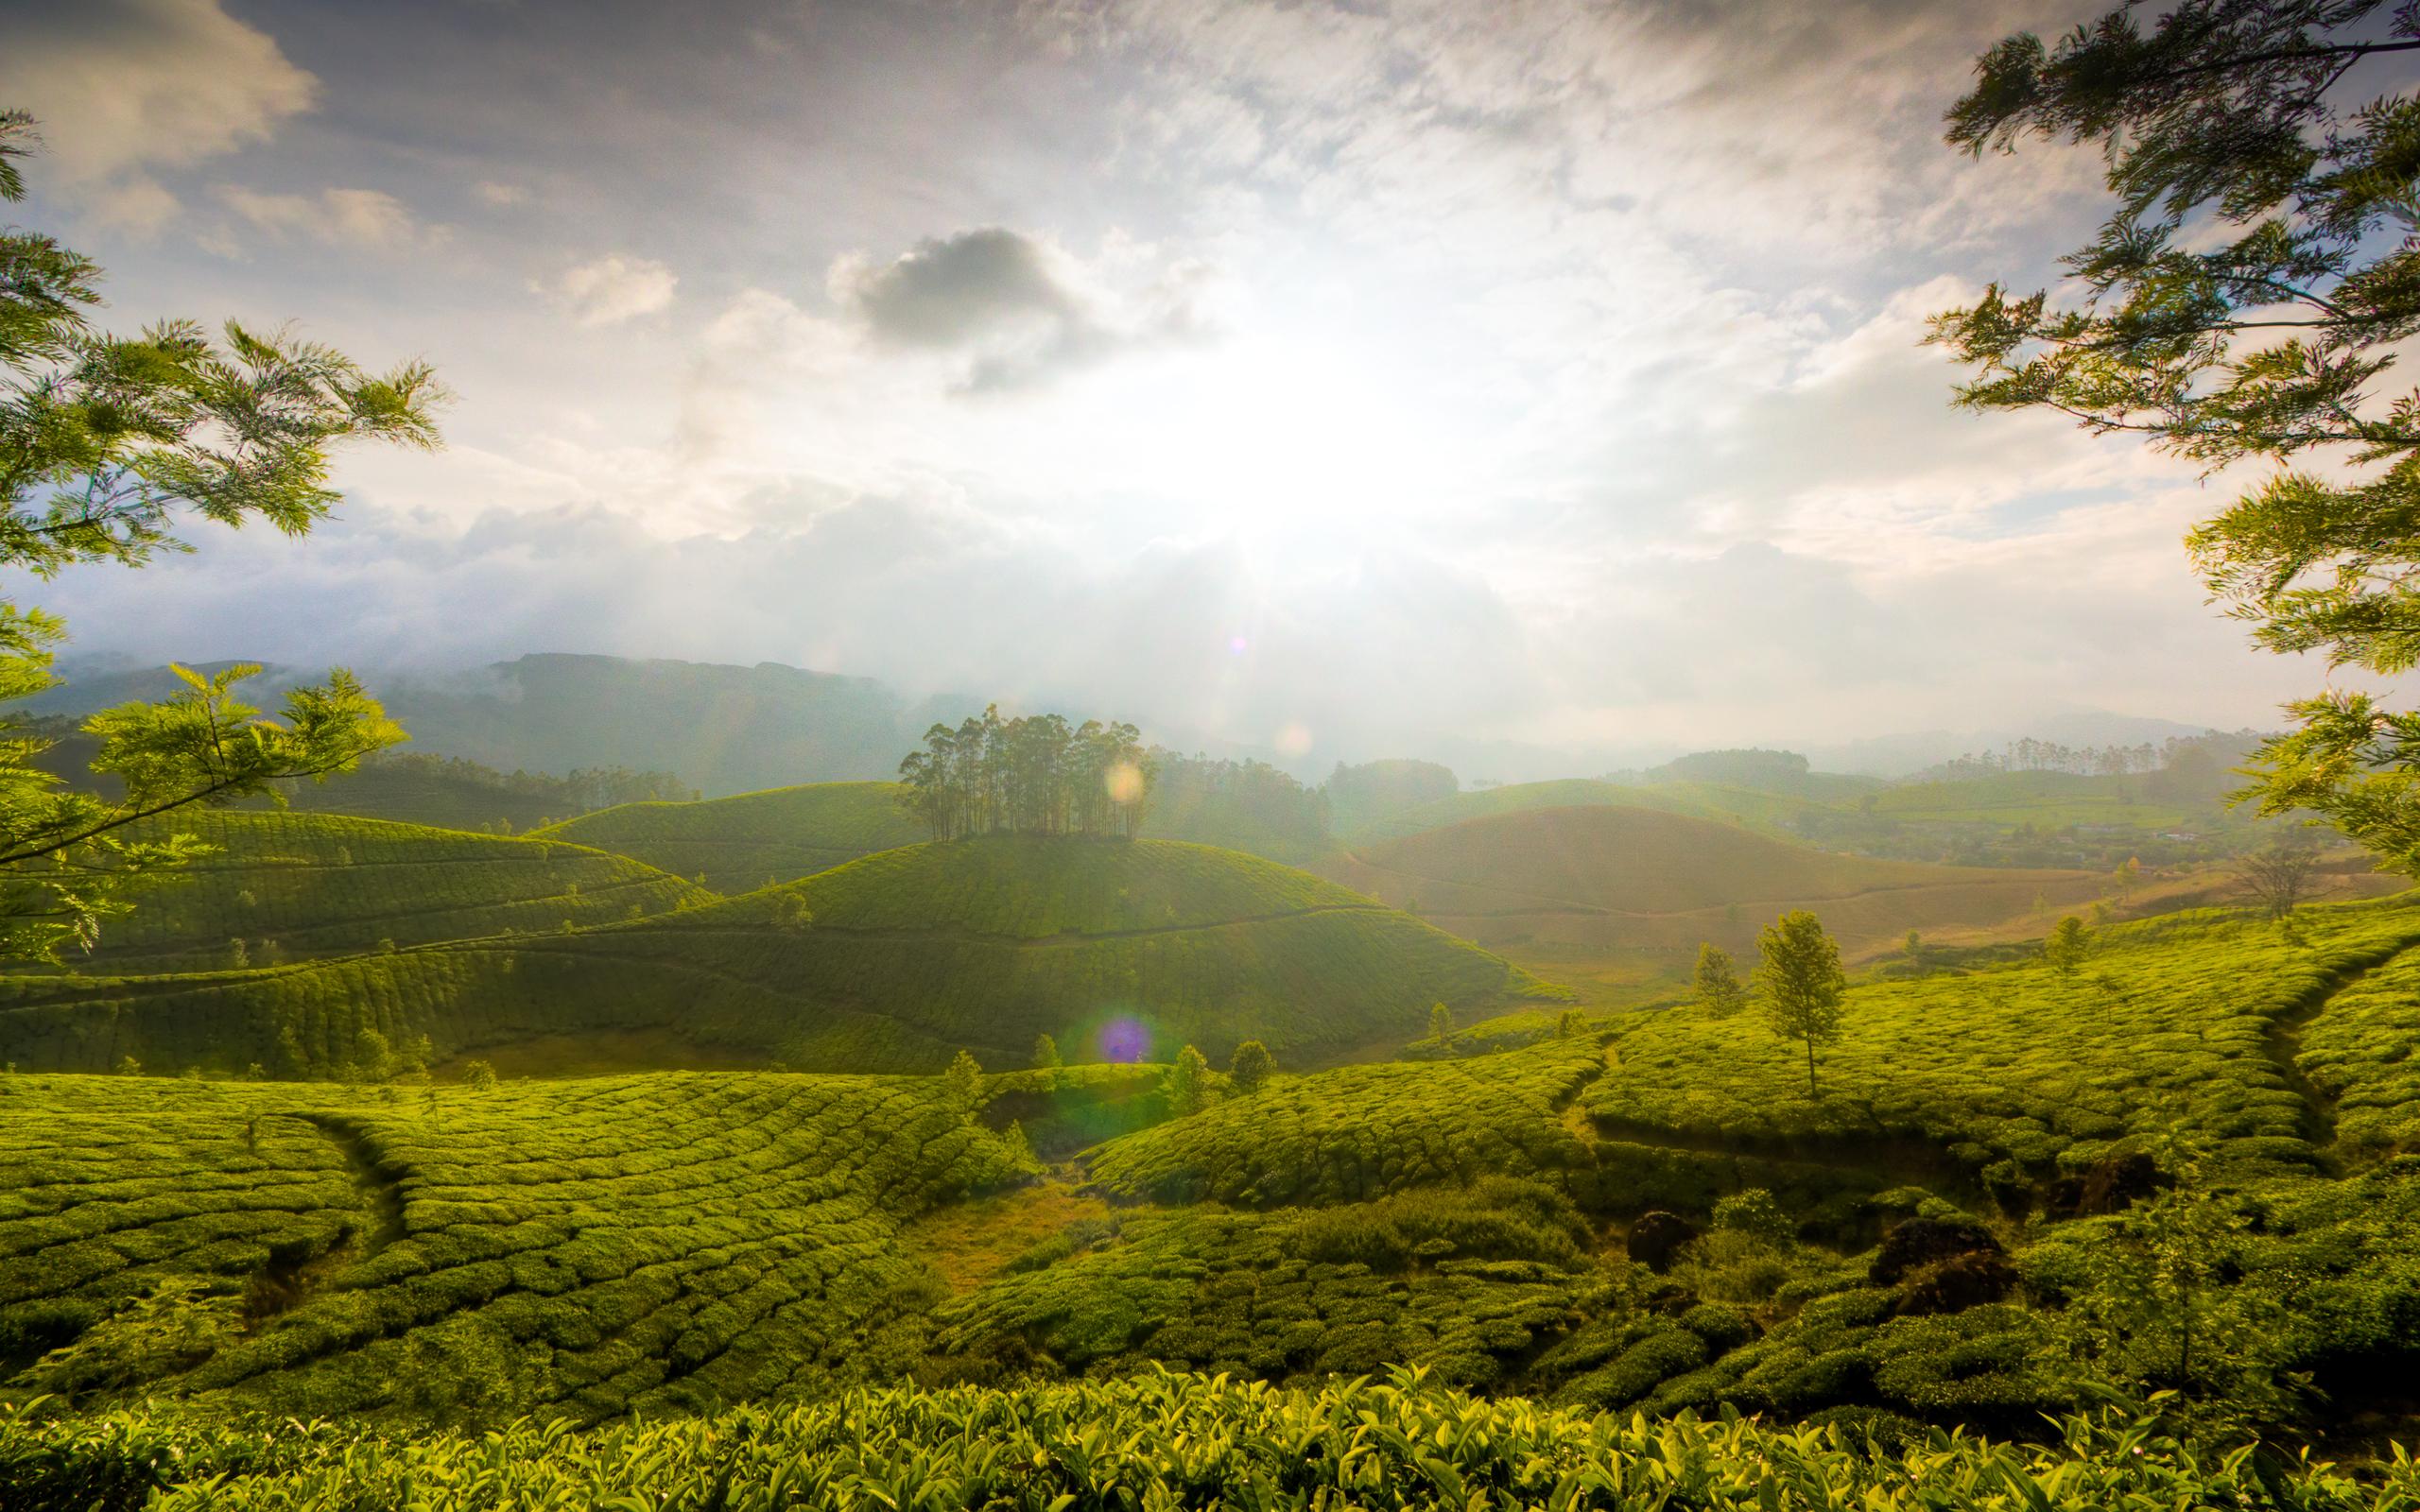 HD Wallpapers Munnar Hills Kerala India